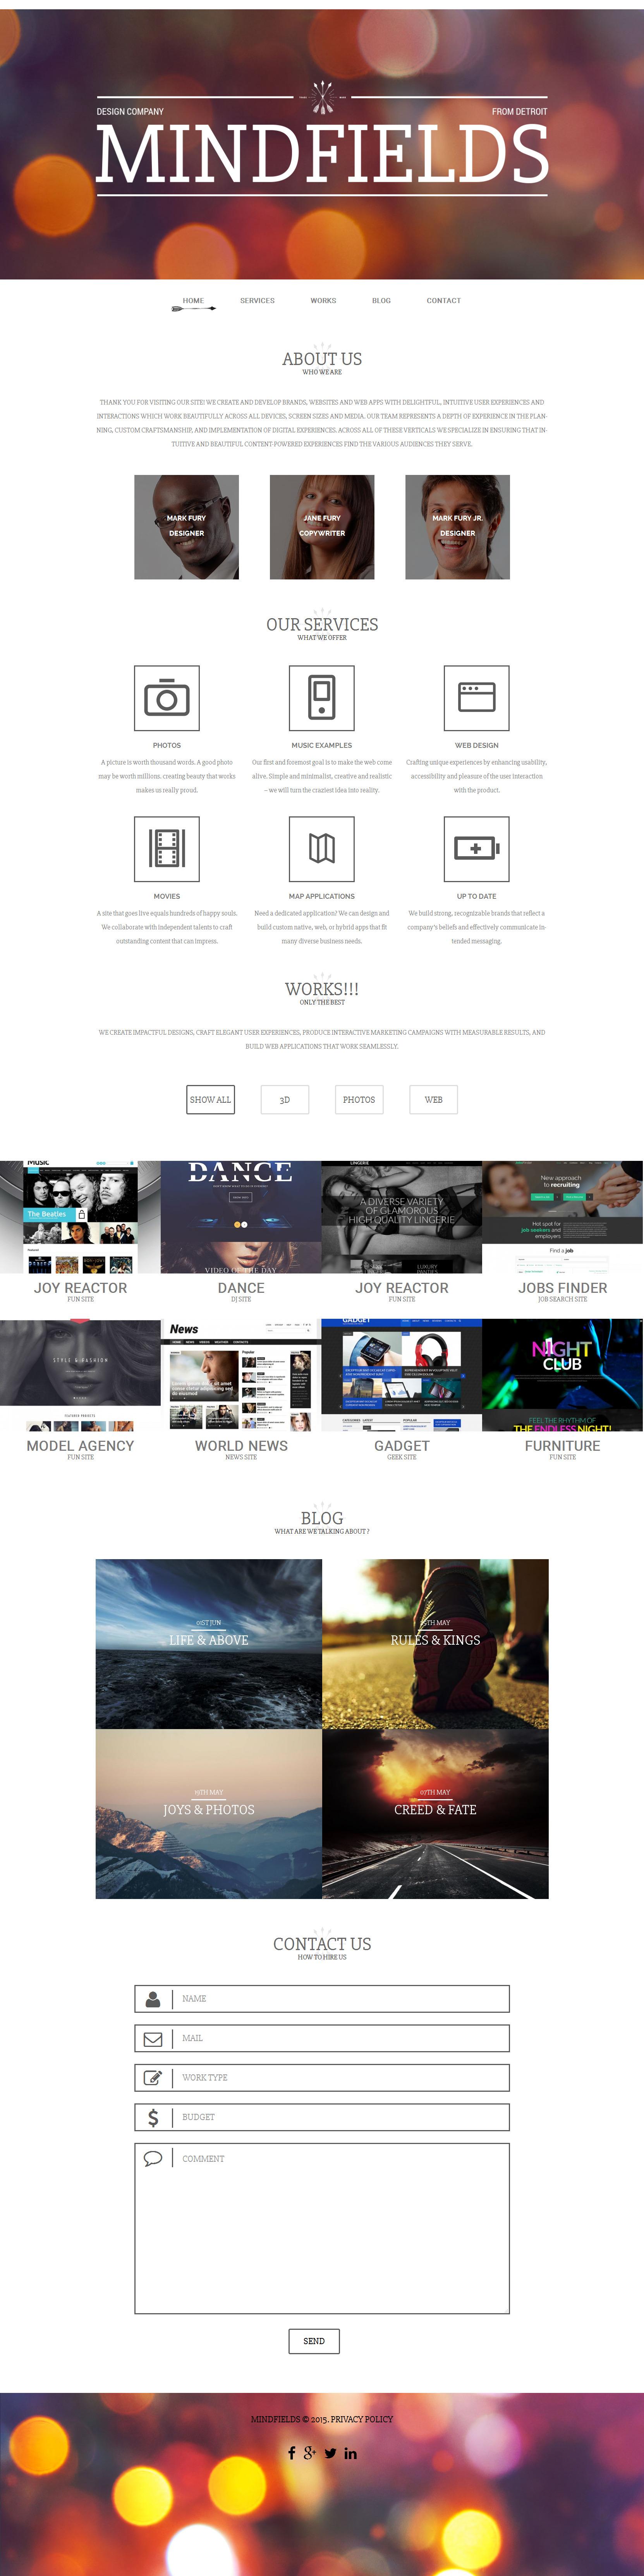 """Mind Fields"" - адаптивний WordPress шаблон №55973 - скріншот"